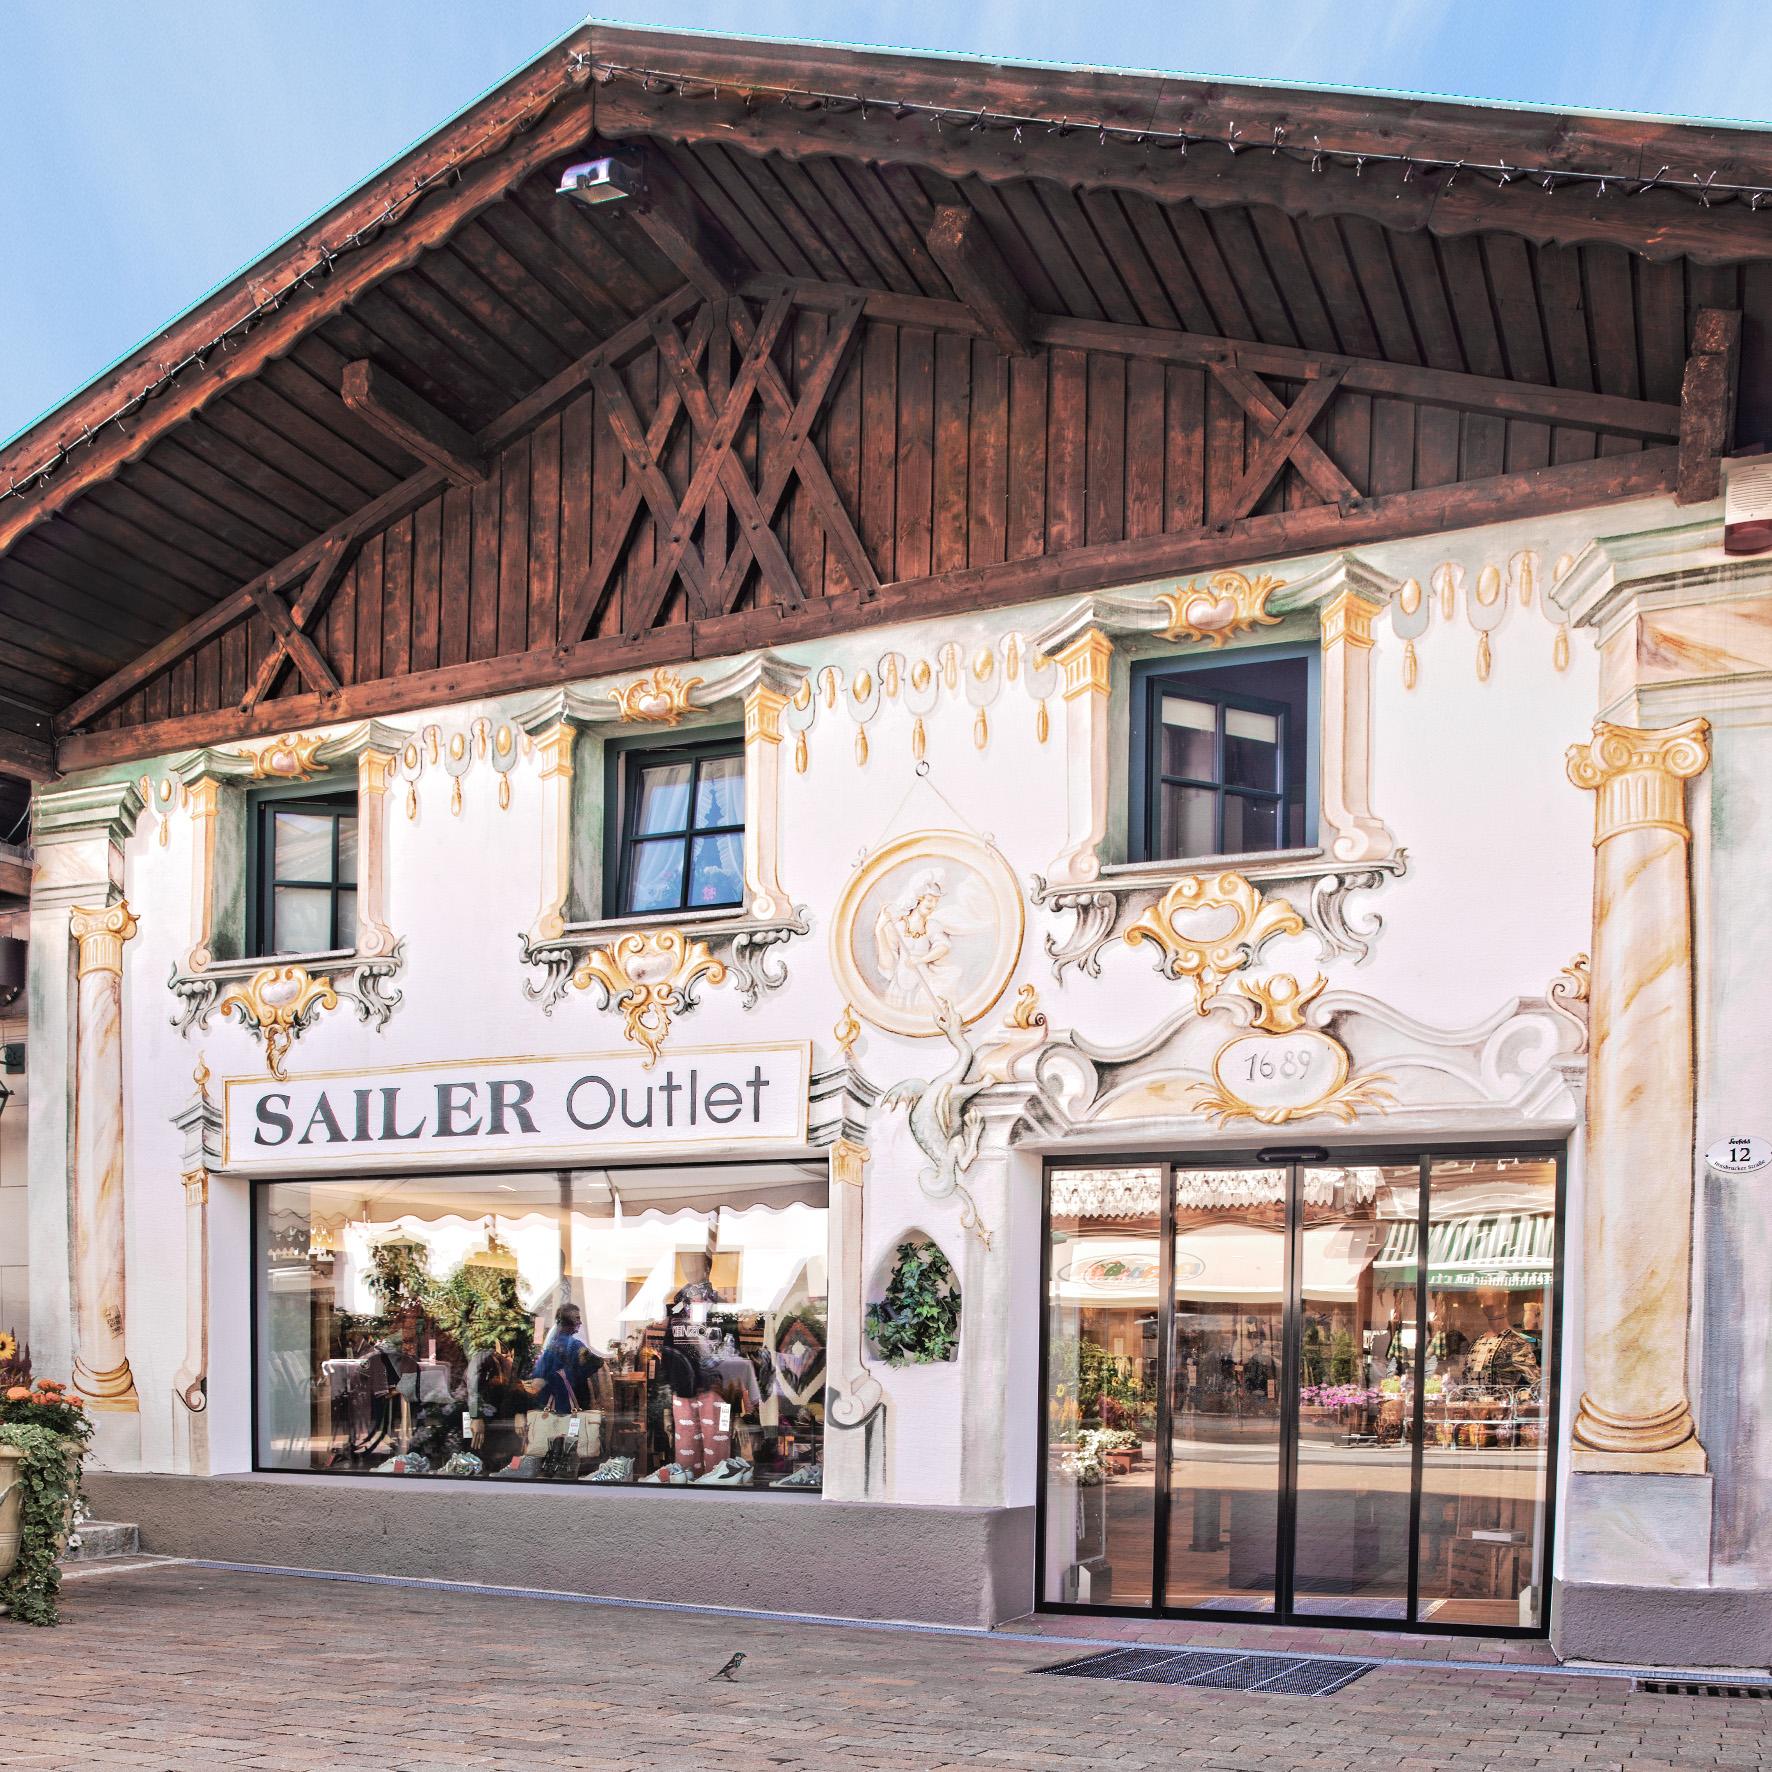 SAILER-Seefeld-Outlet-Image-Hoover-Startseite-tirol-Austria